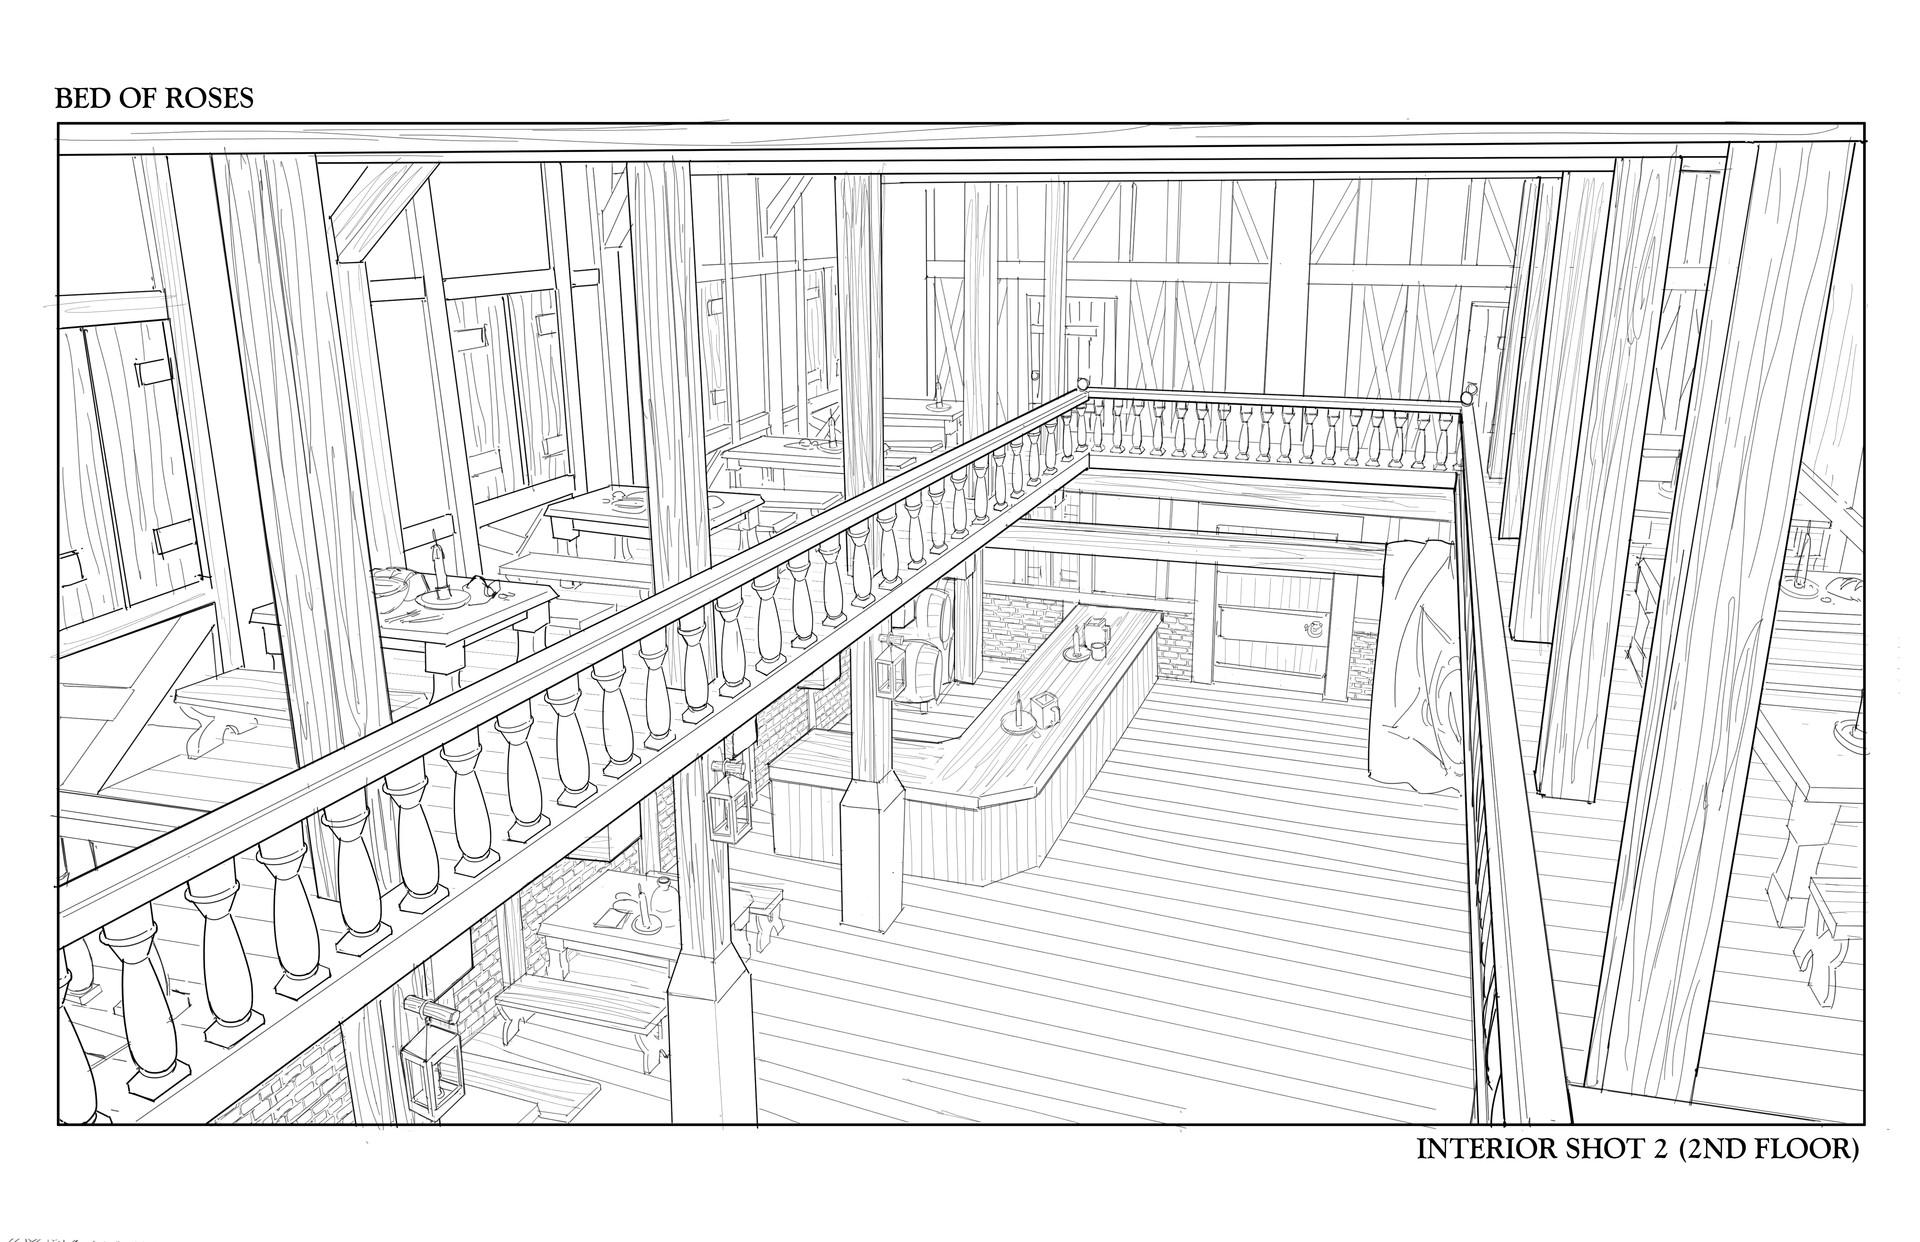 paul-chang-weldon-sketches-interior-shot-2.jpg